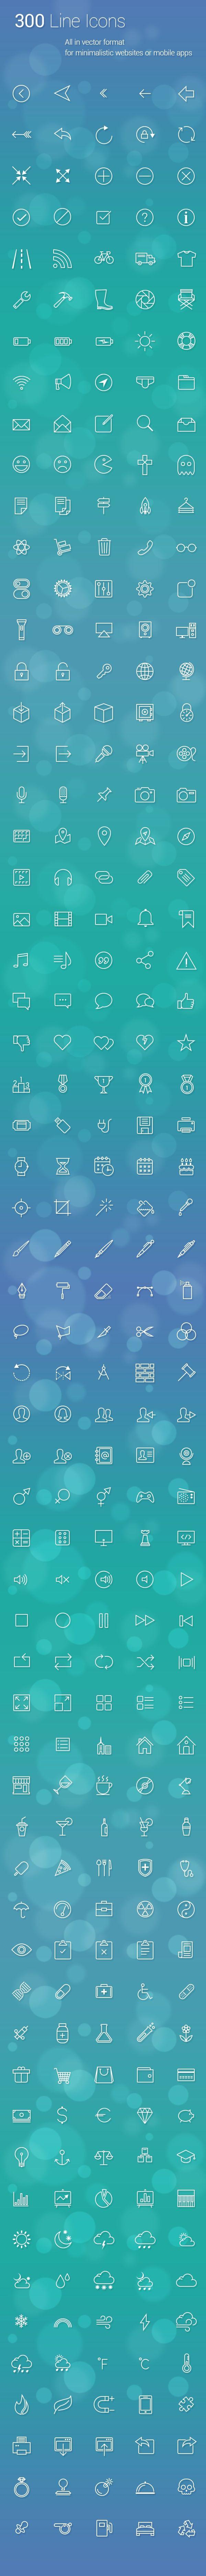 300 line icon